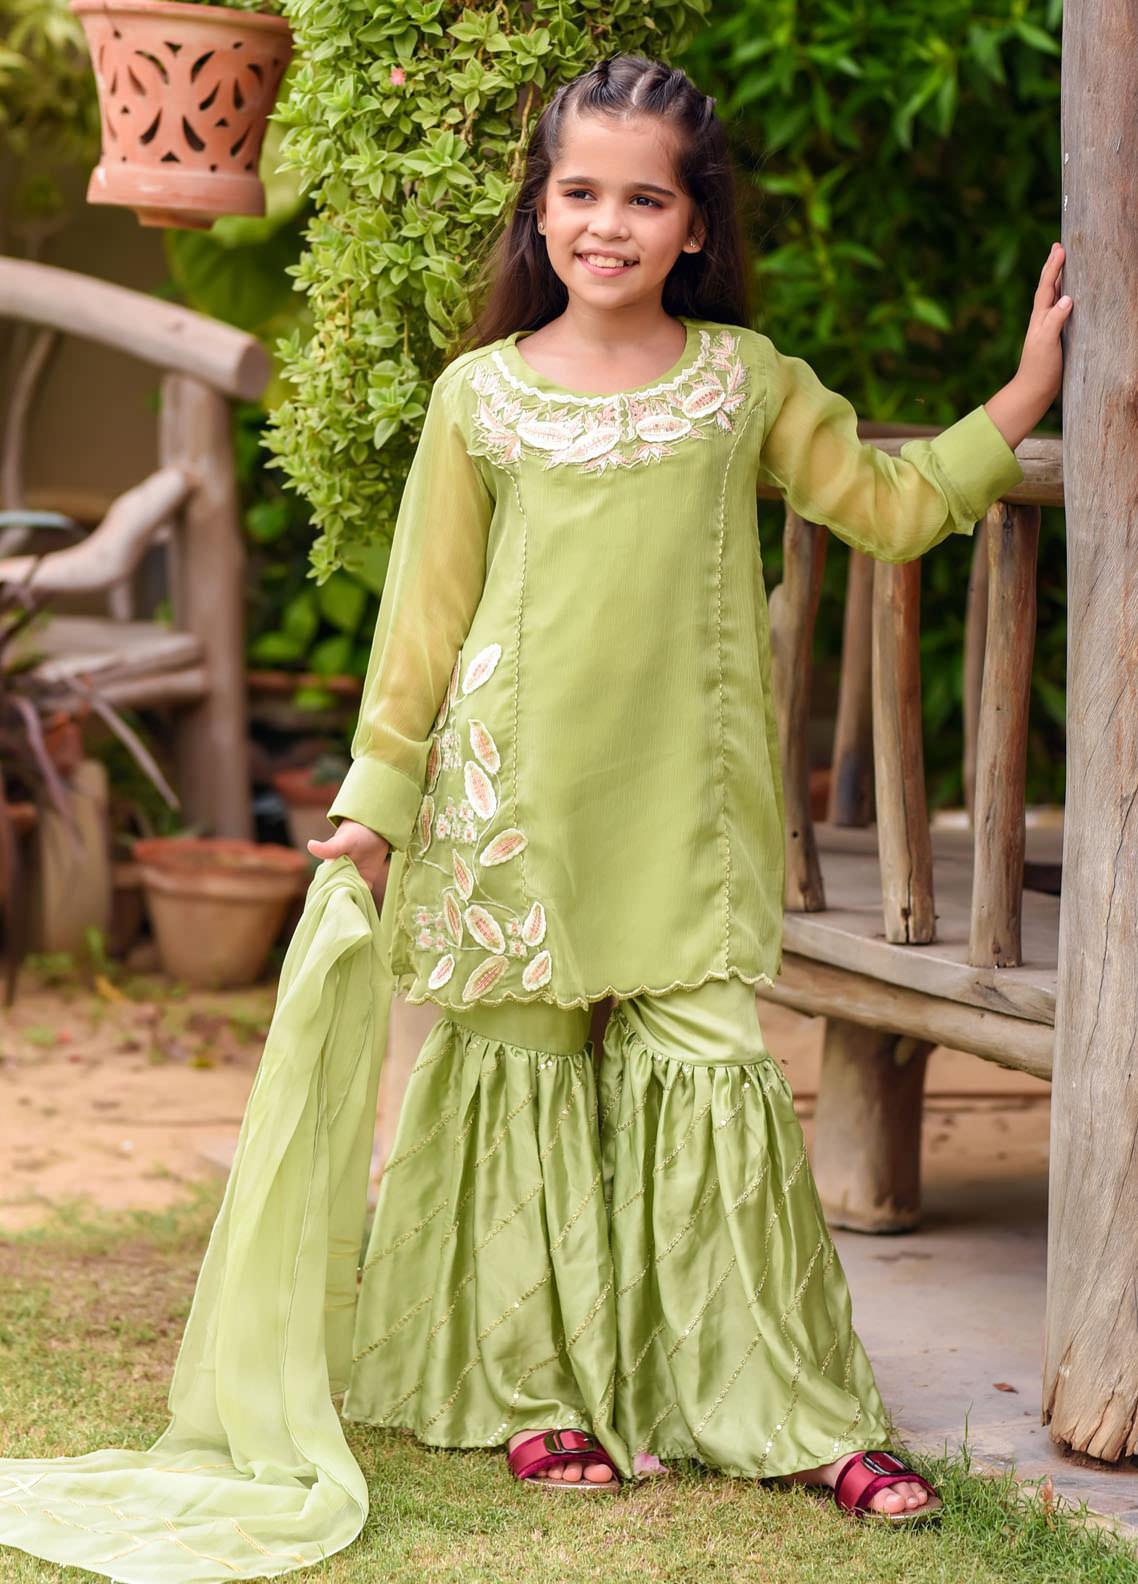 Ochre Chiffon Fancy 3 Piece Suit for Girls -  OFW-284 Parrot Green